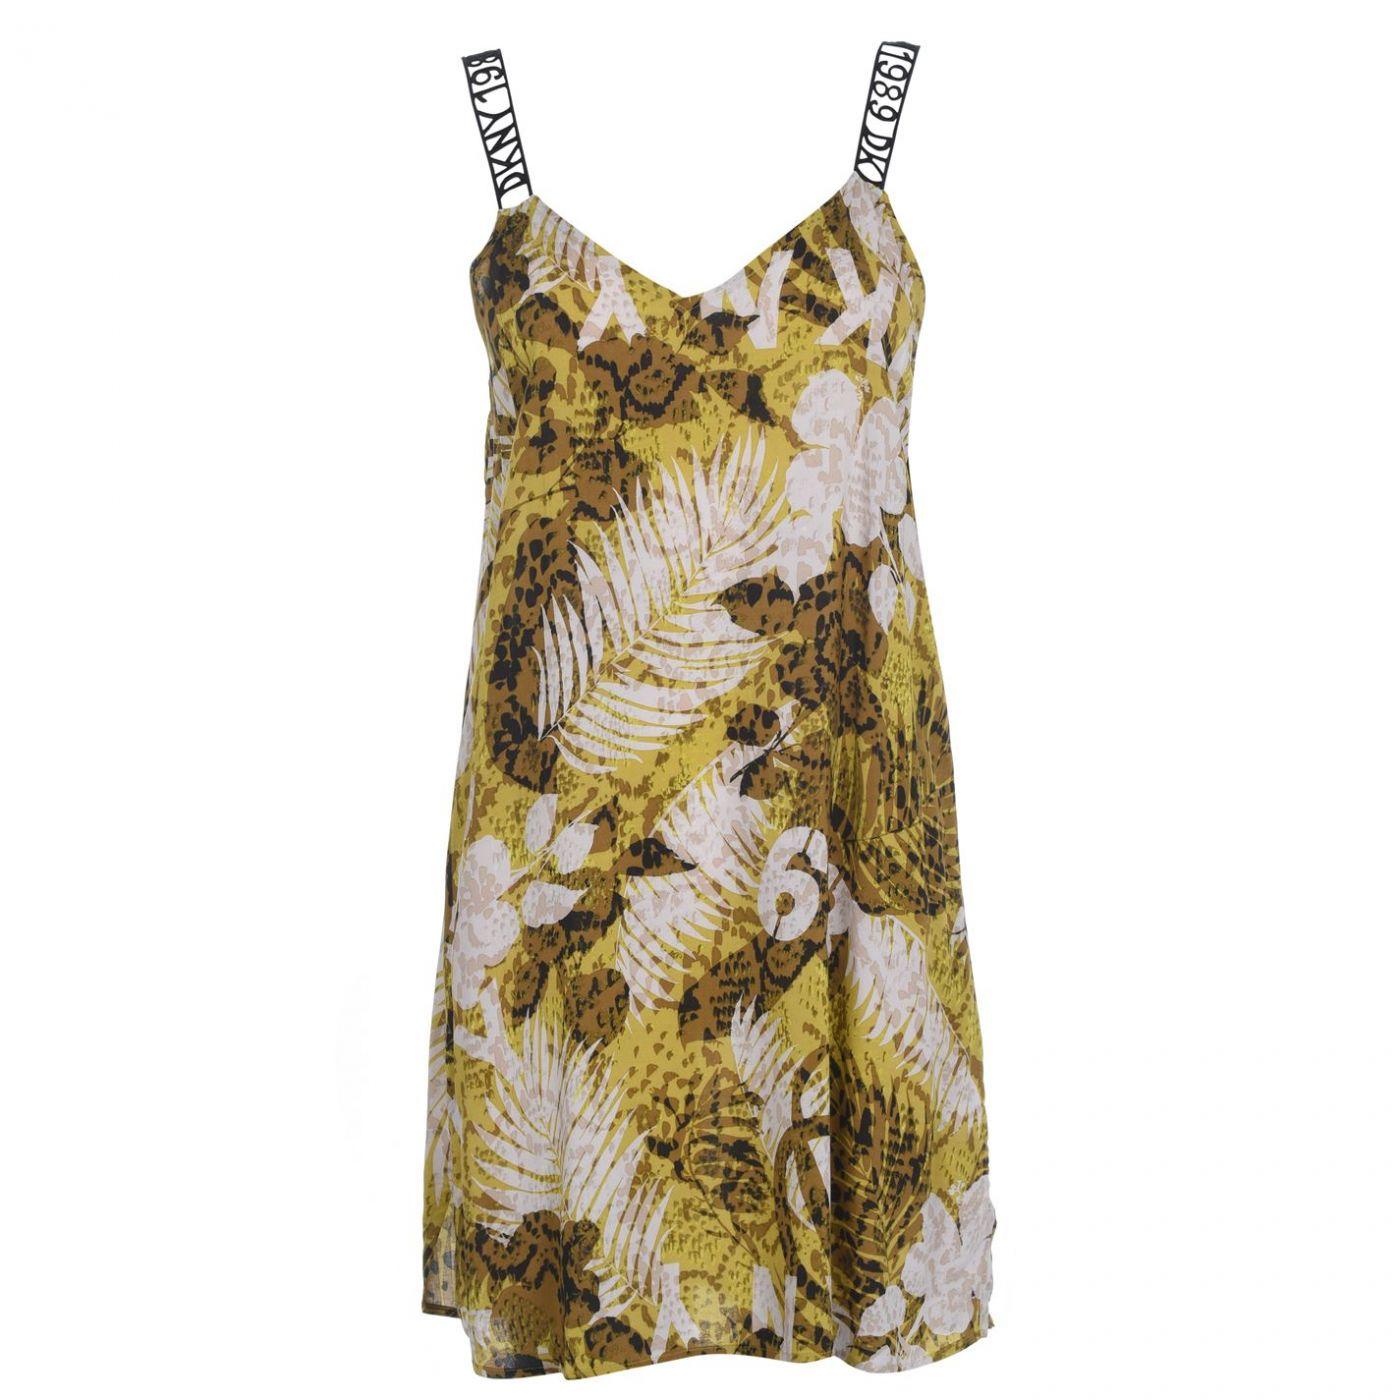 DKNY Palm Nightgown